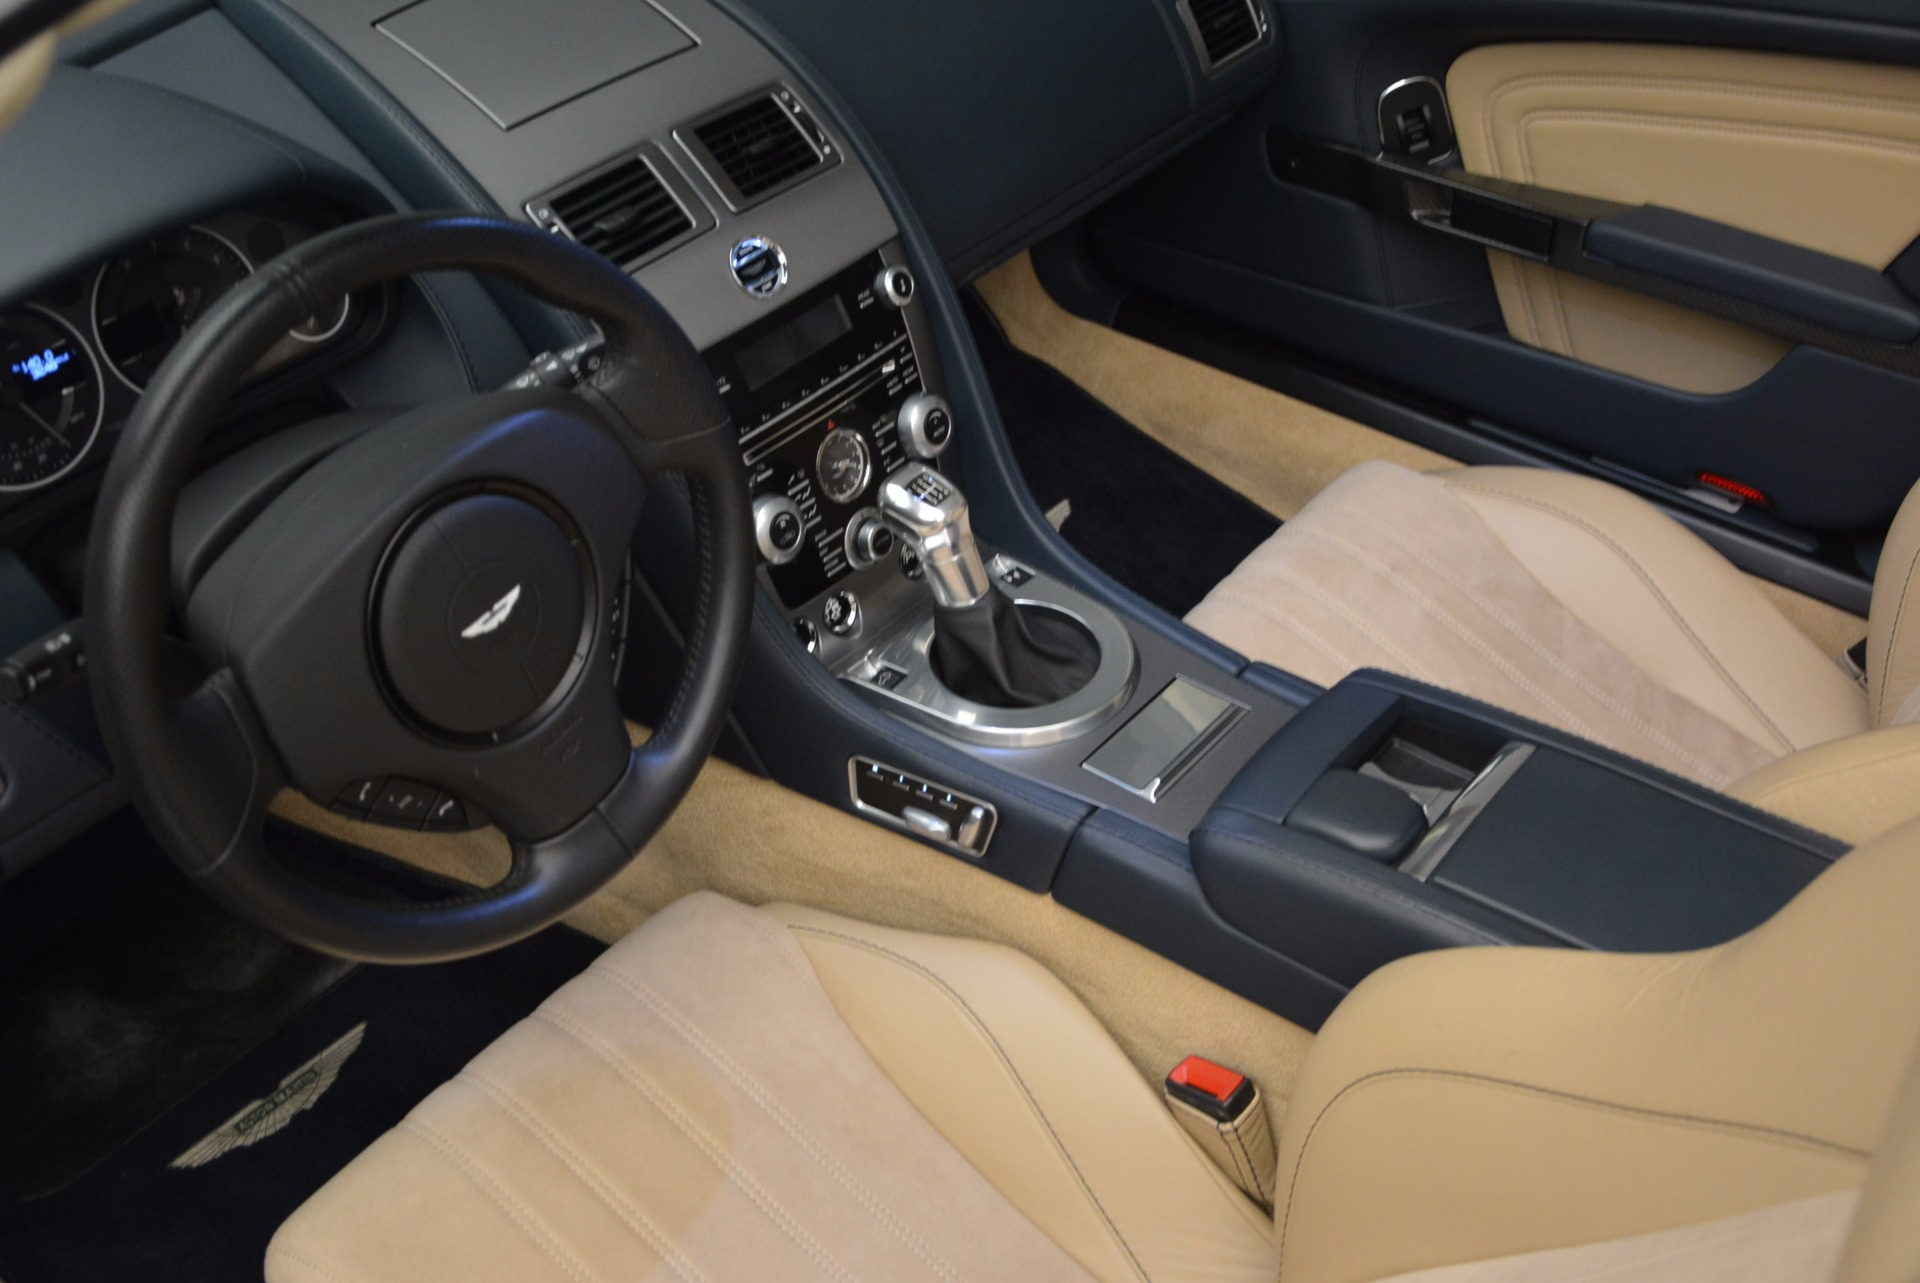 Used 2012 Aston Martin DBS Volante For Sale In Greenwich, CT 644_p25